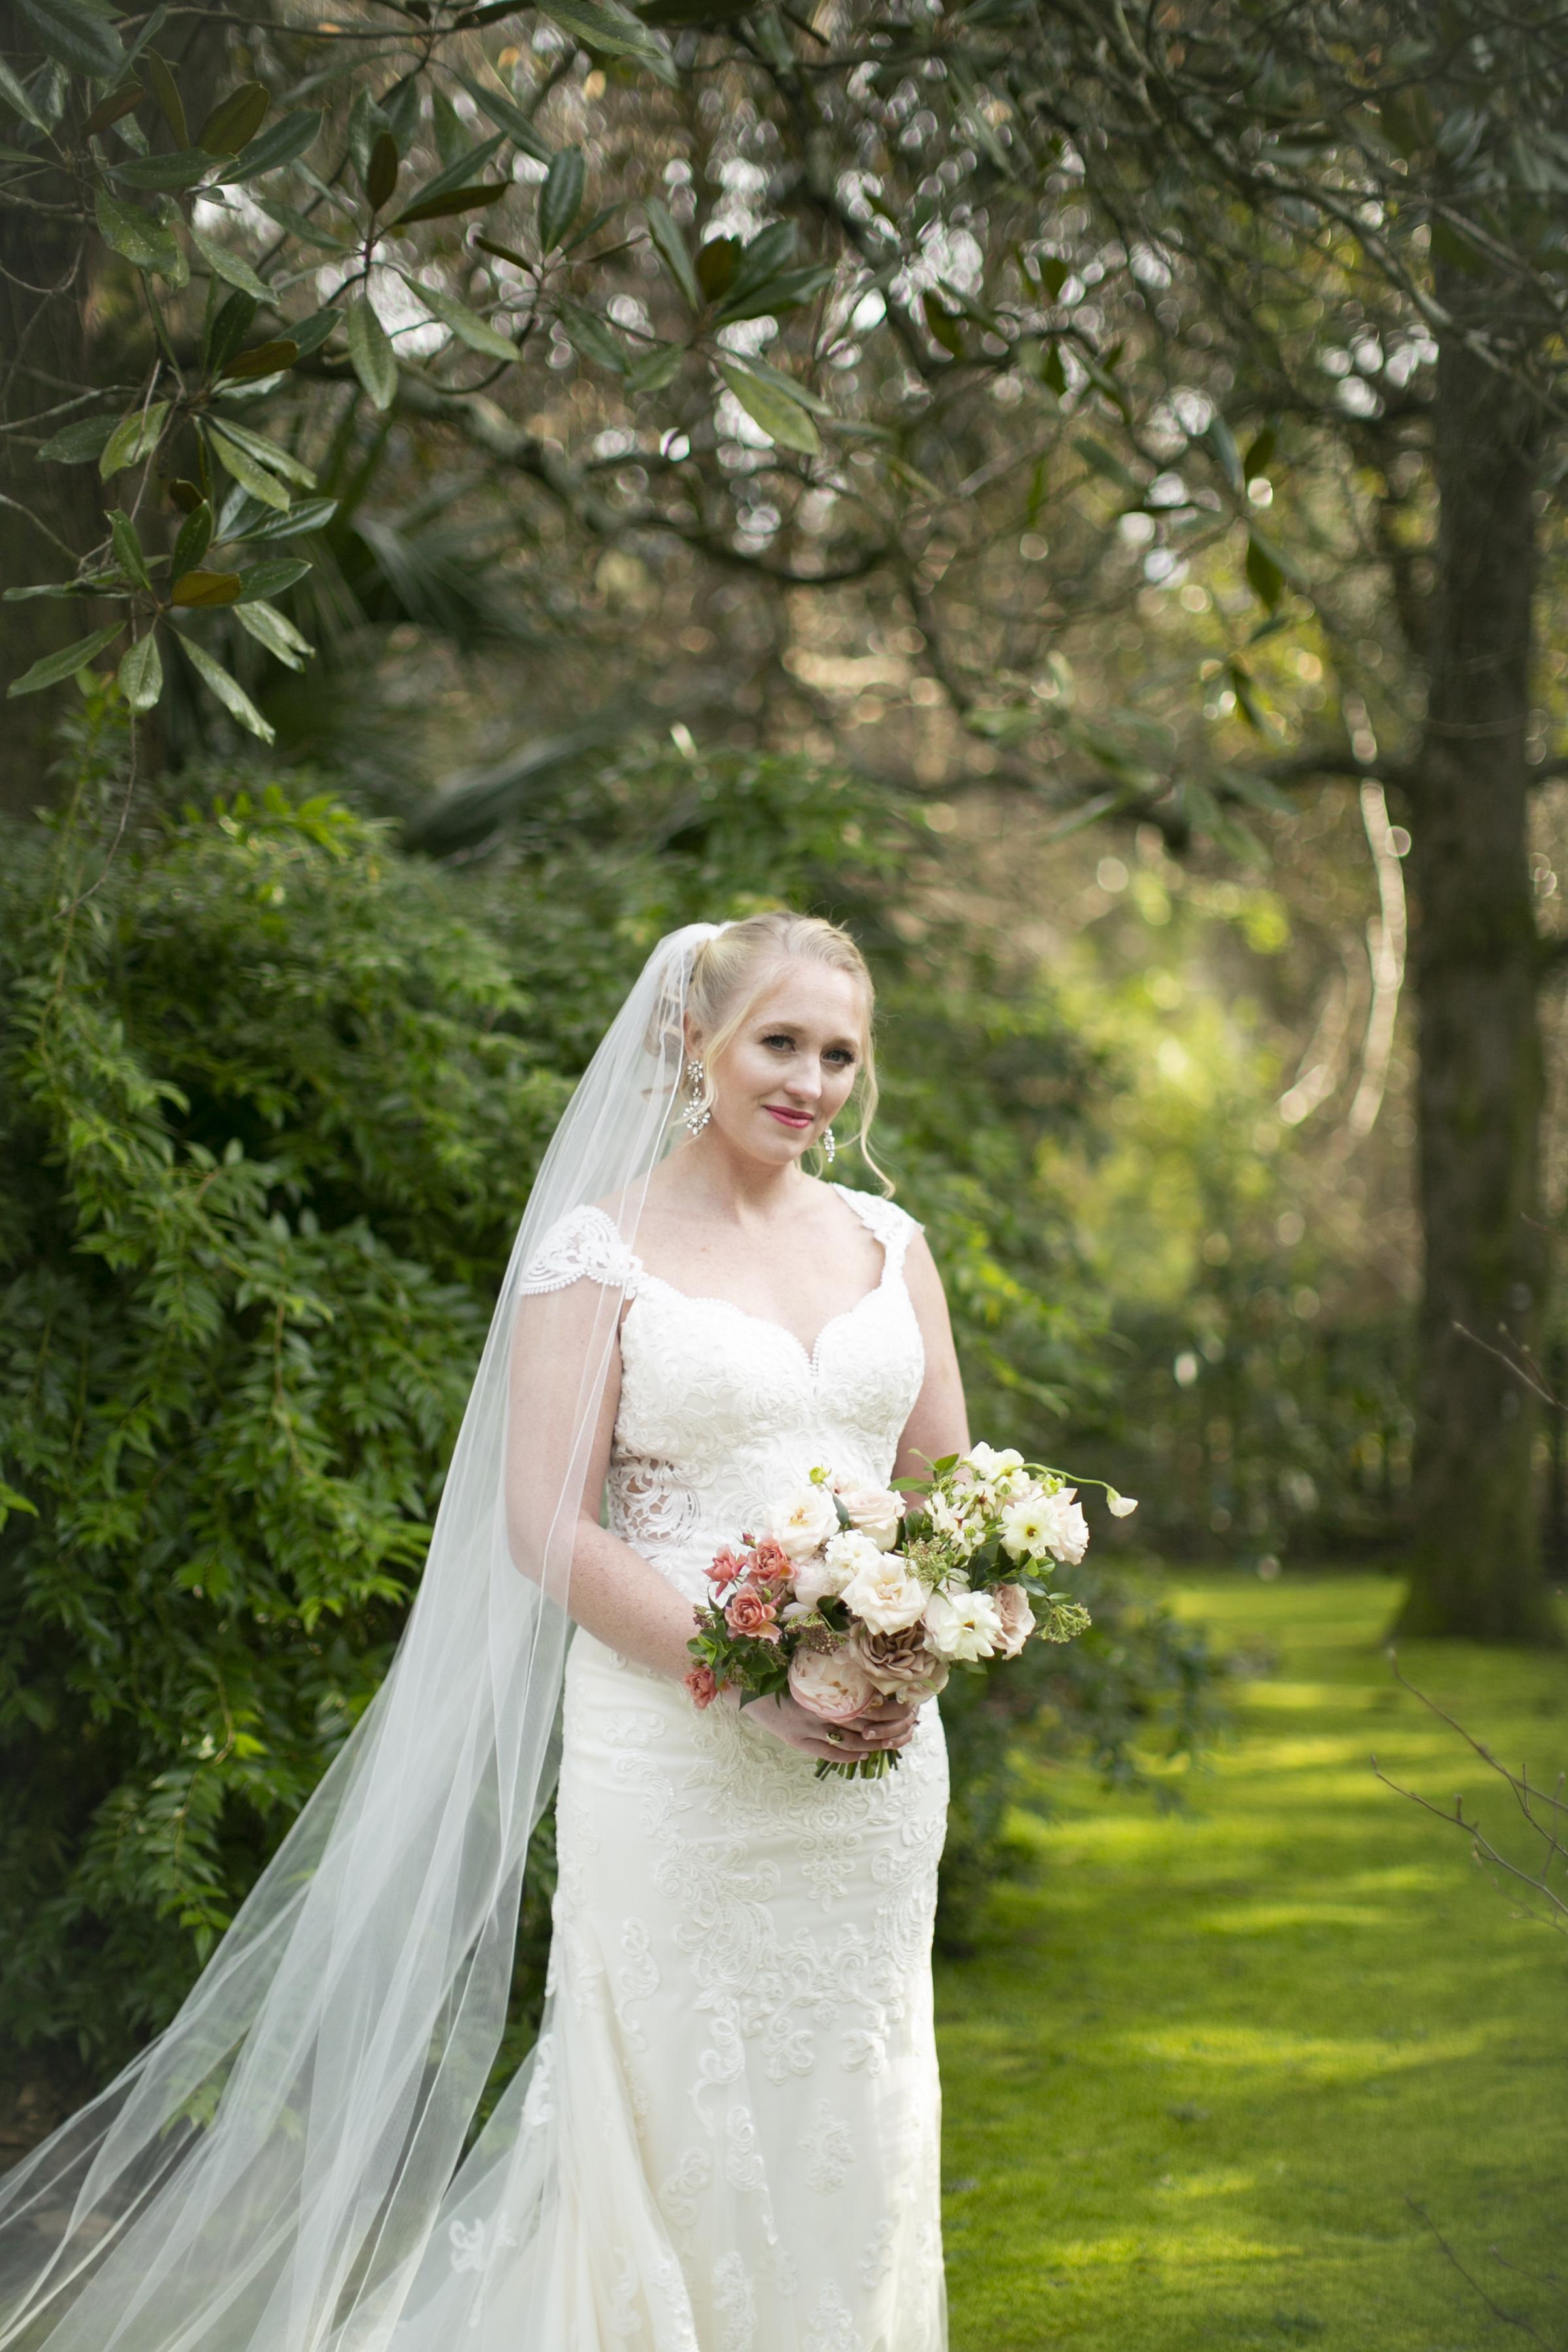 columbia_sc_wedding_photographer_16.jpg